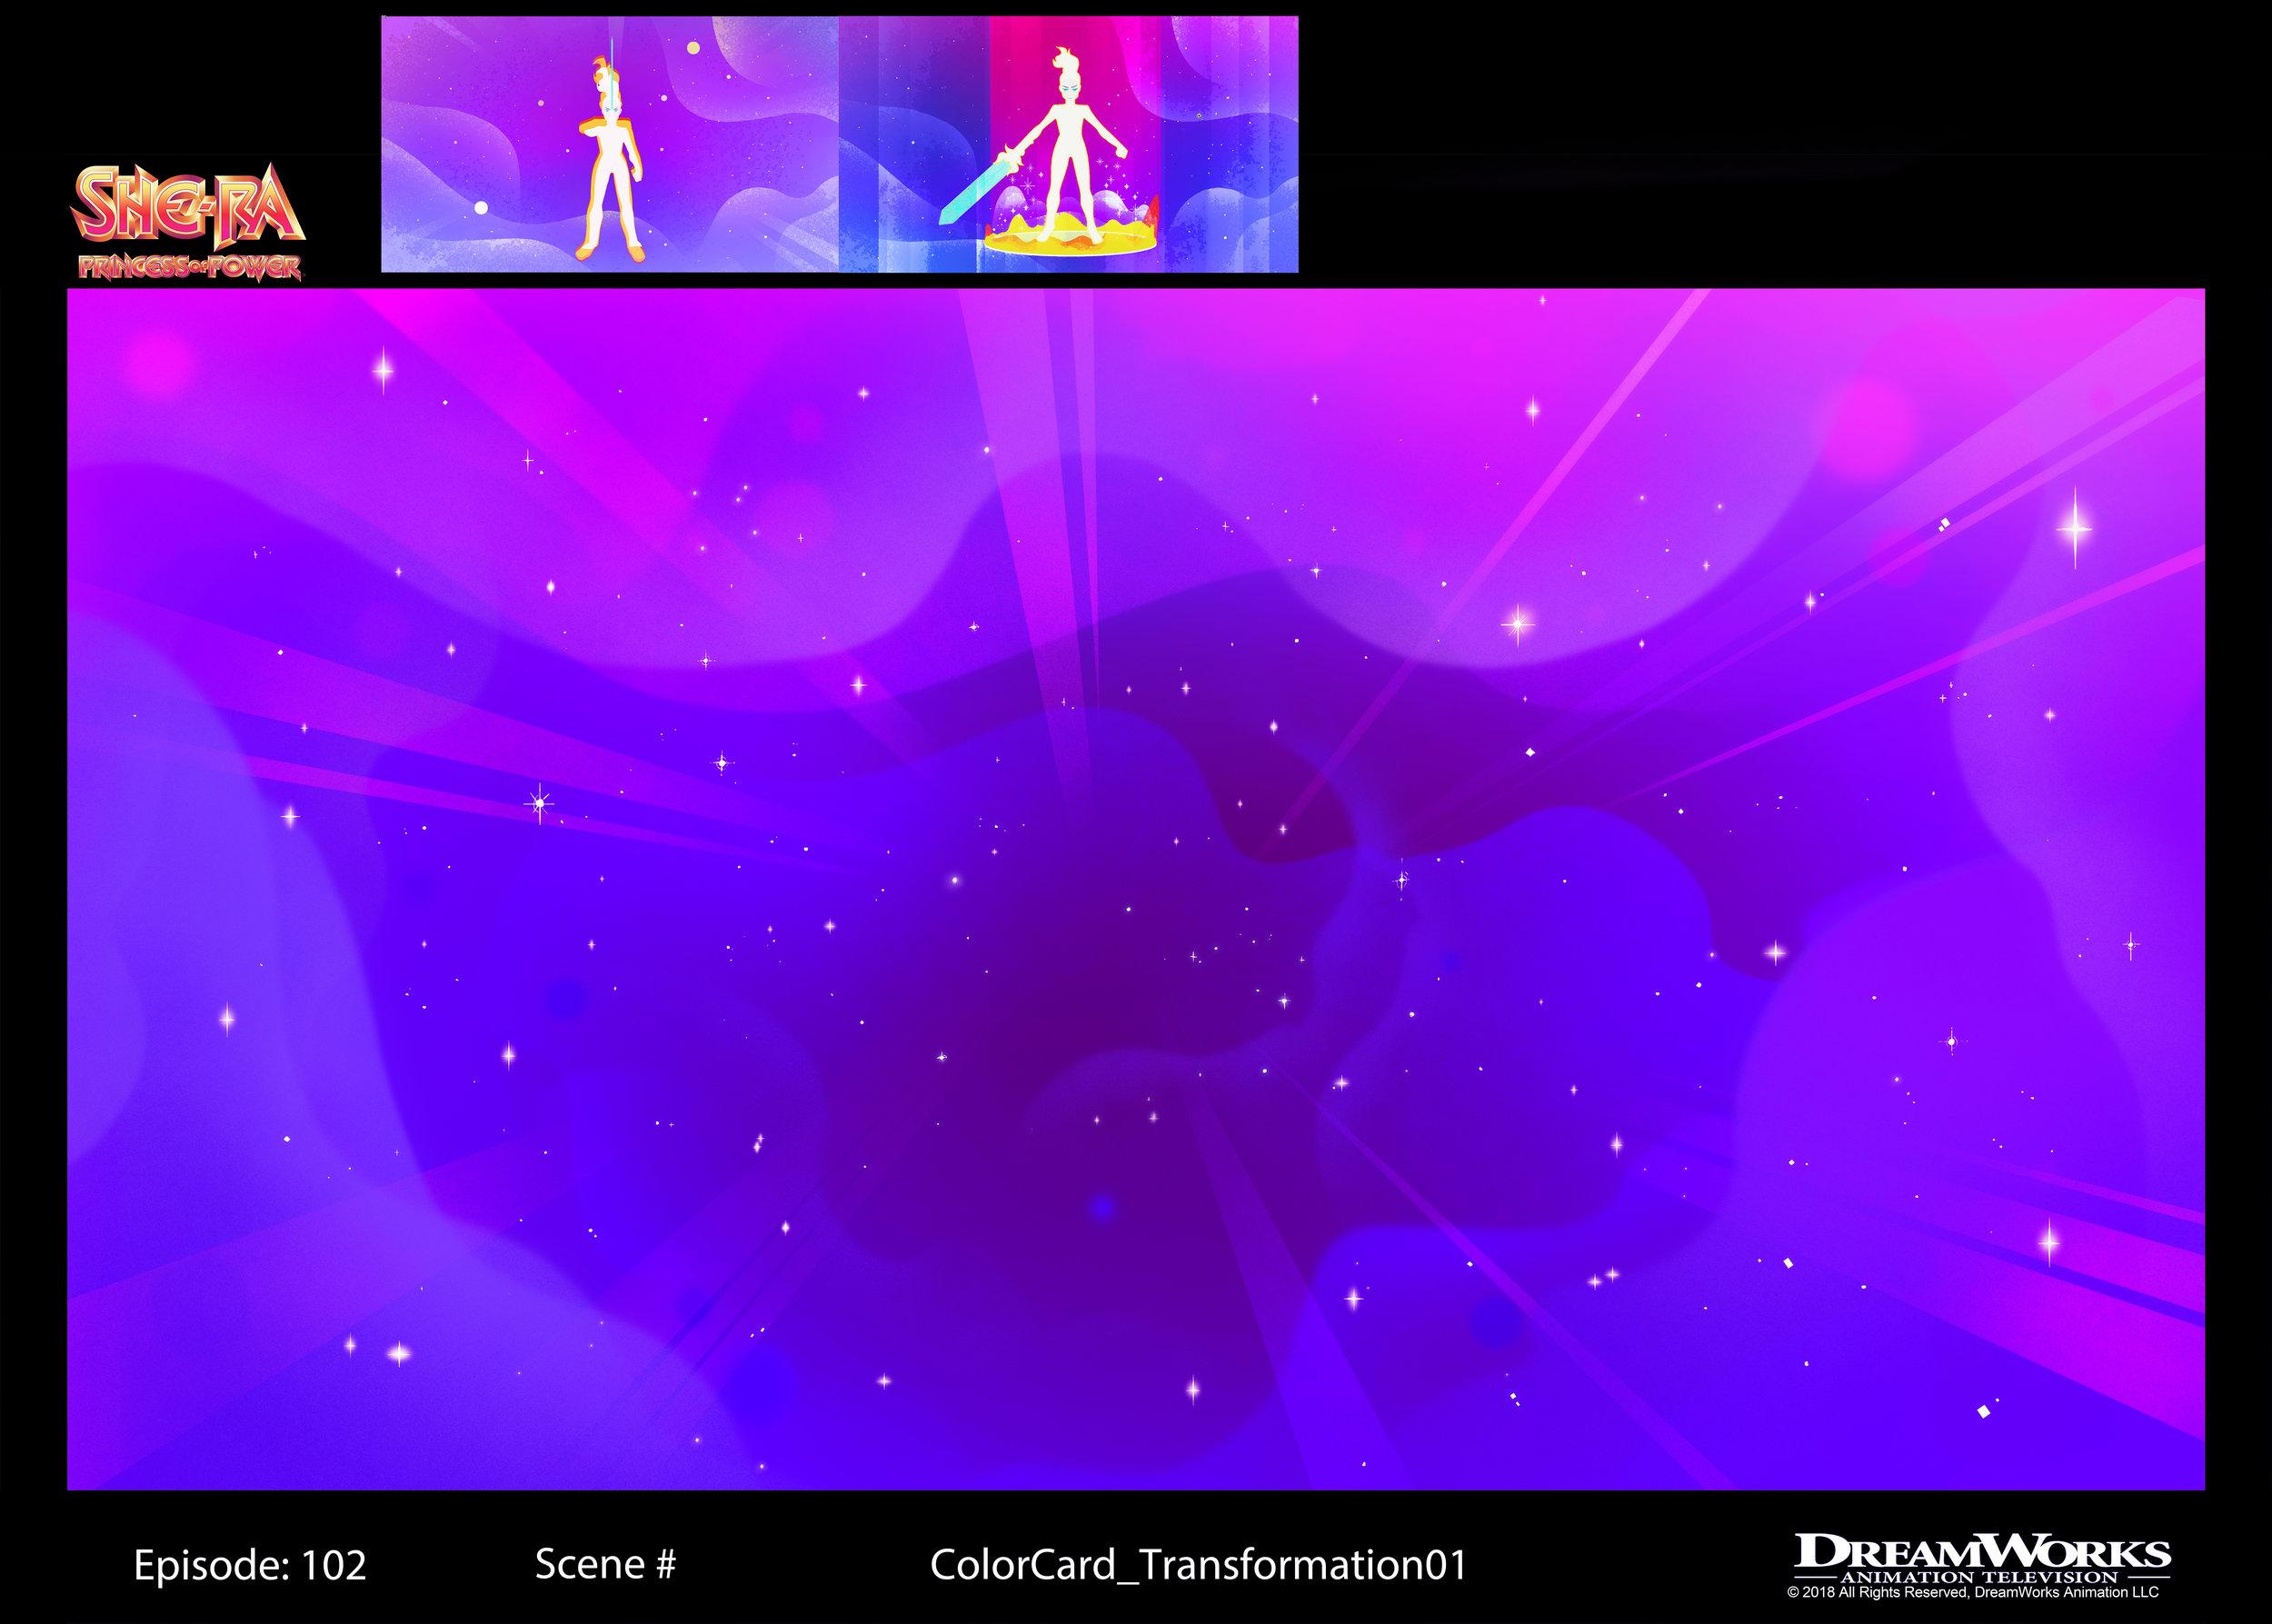 SHE102_ColorCard_Transformation01_CLR_v001_GK copy.jpg